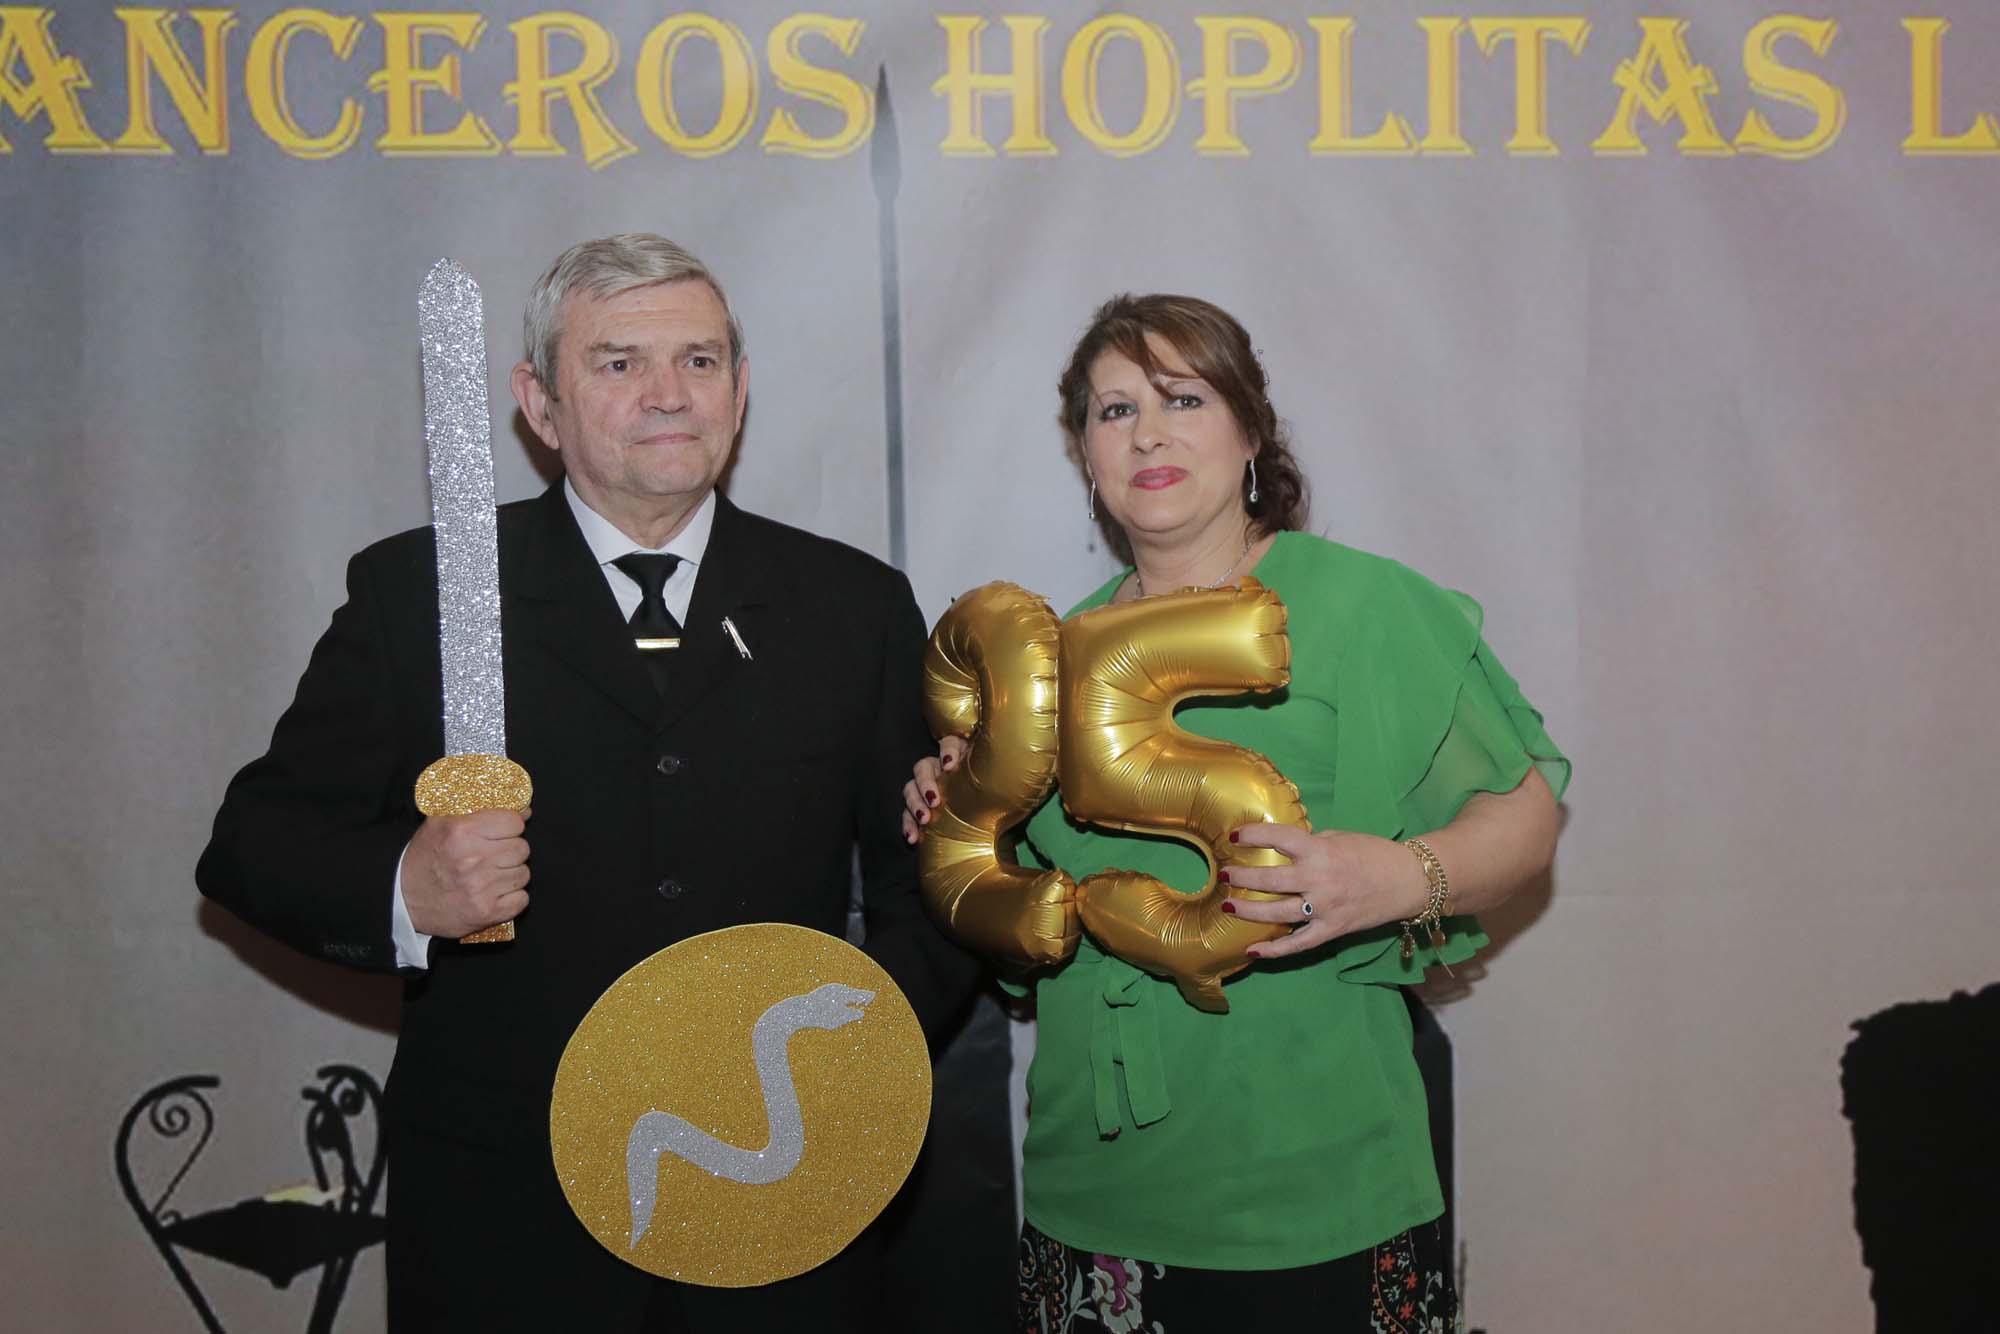 Lanceros Hoplitas Libios  (183)